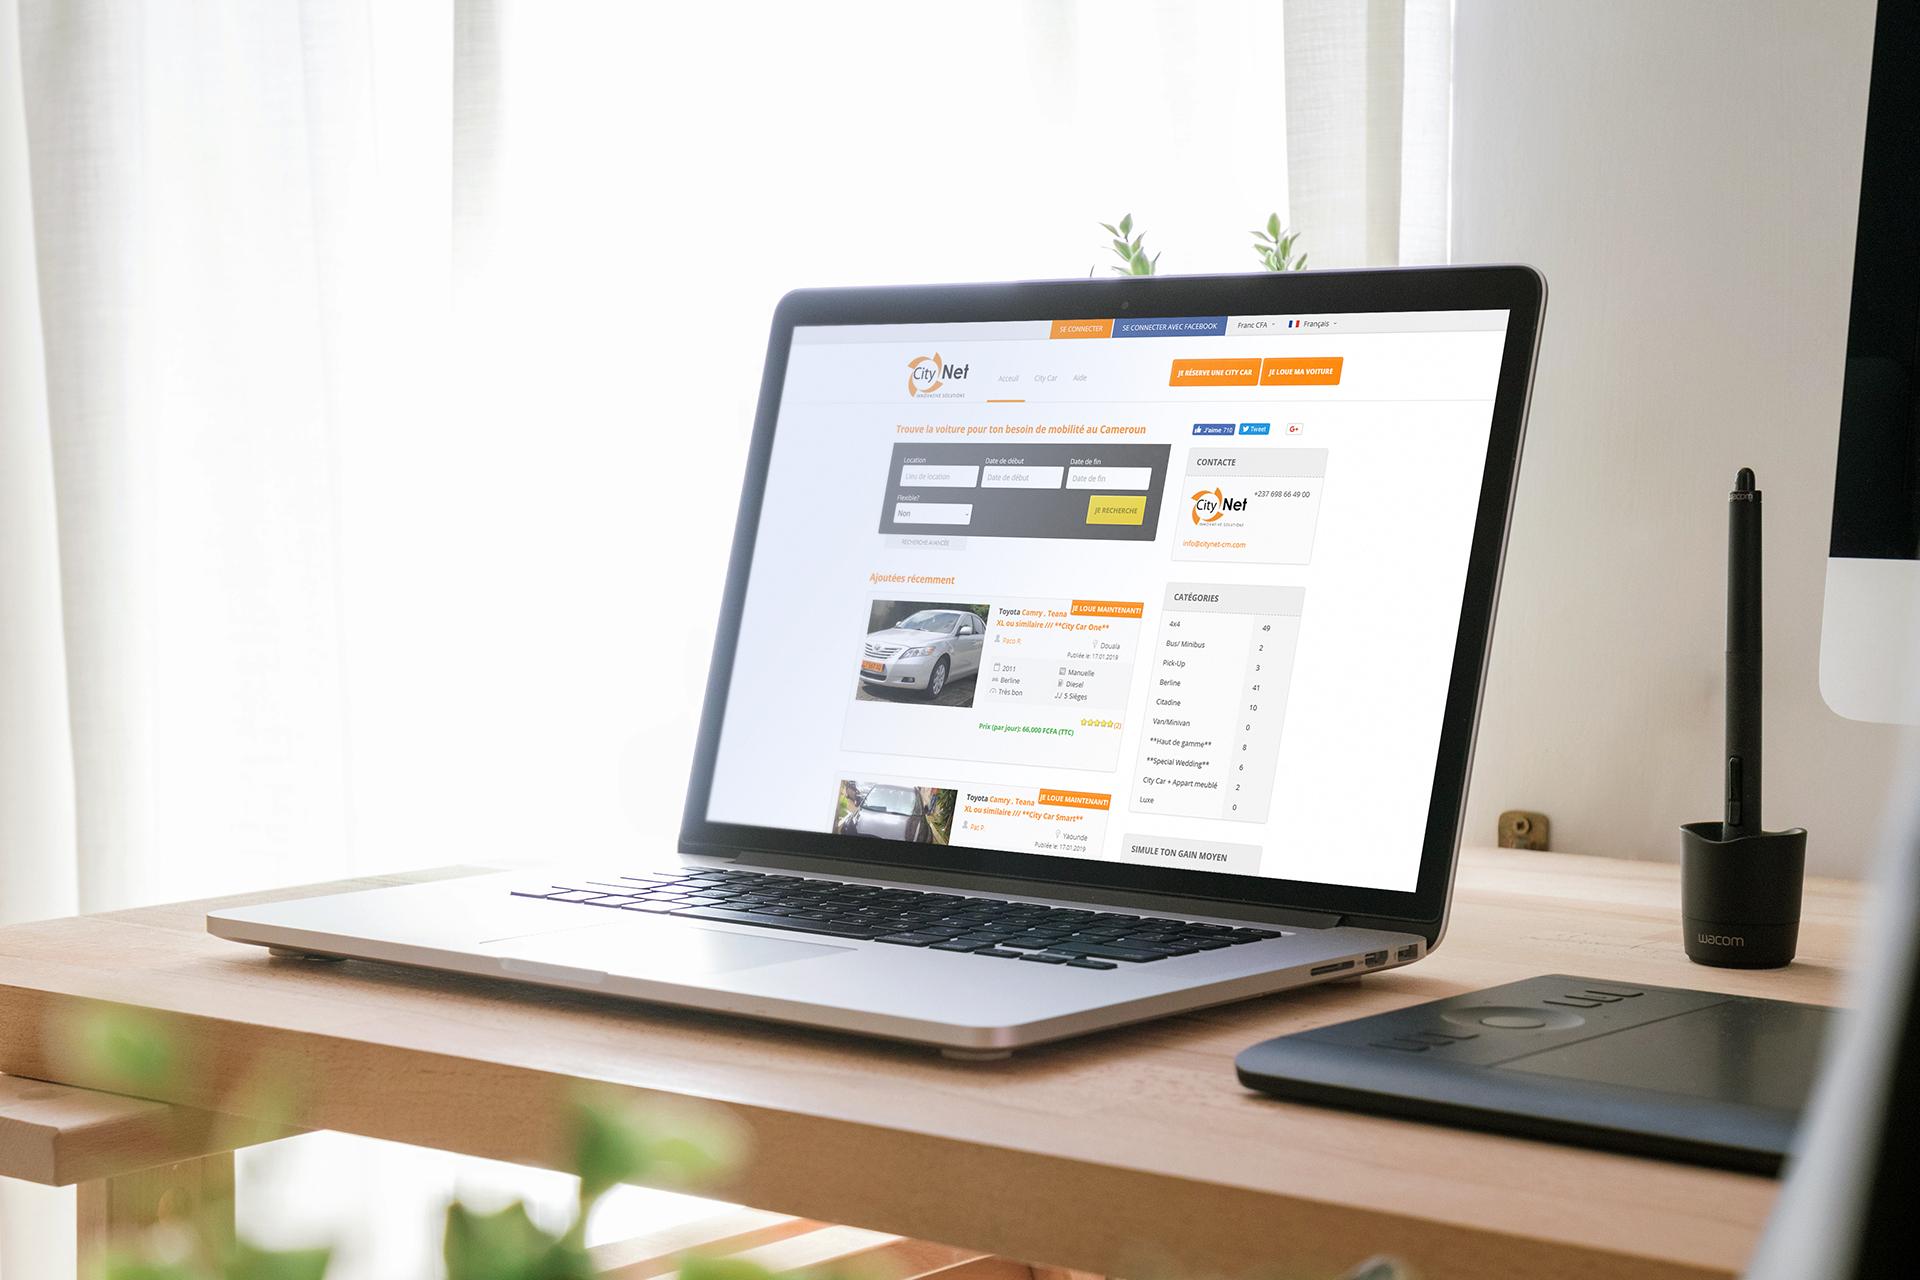 citynet - Privates Carsharing per Web - Peer-to-Peer-Carsharing Plattform